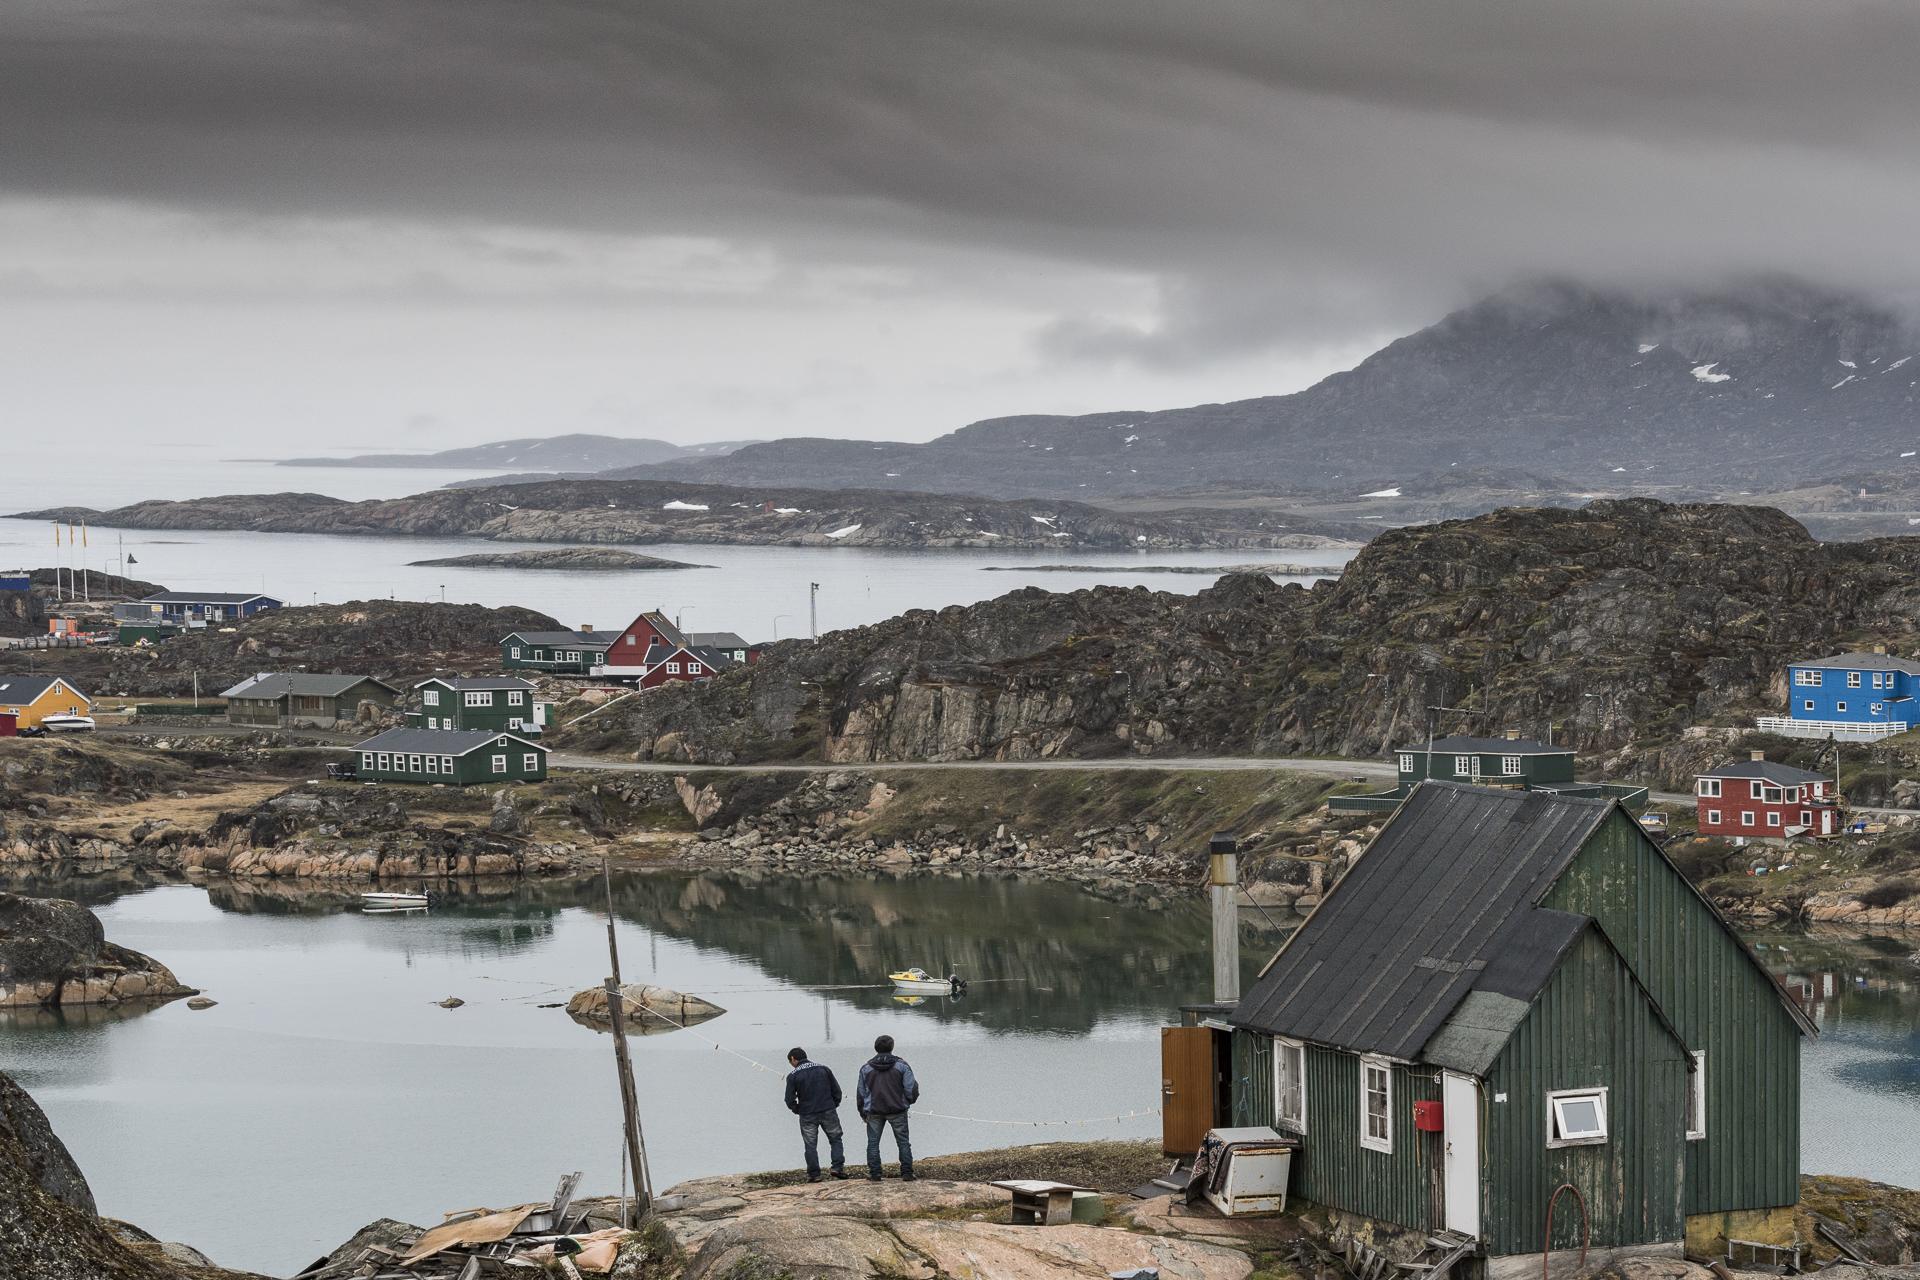 24.Defibaugh_Greenland_Sisimiut_81.jpg